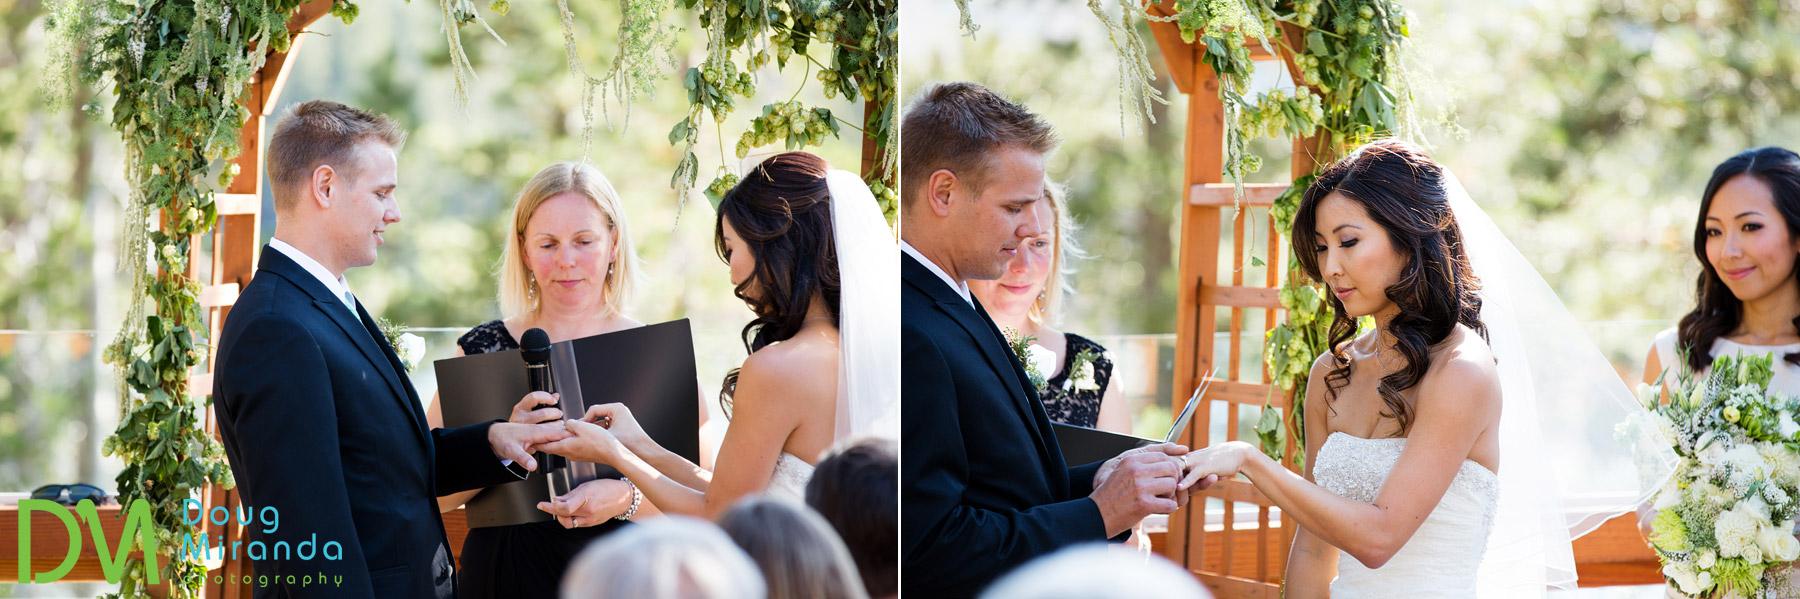 sugar-bowl-wedding-photography-19